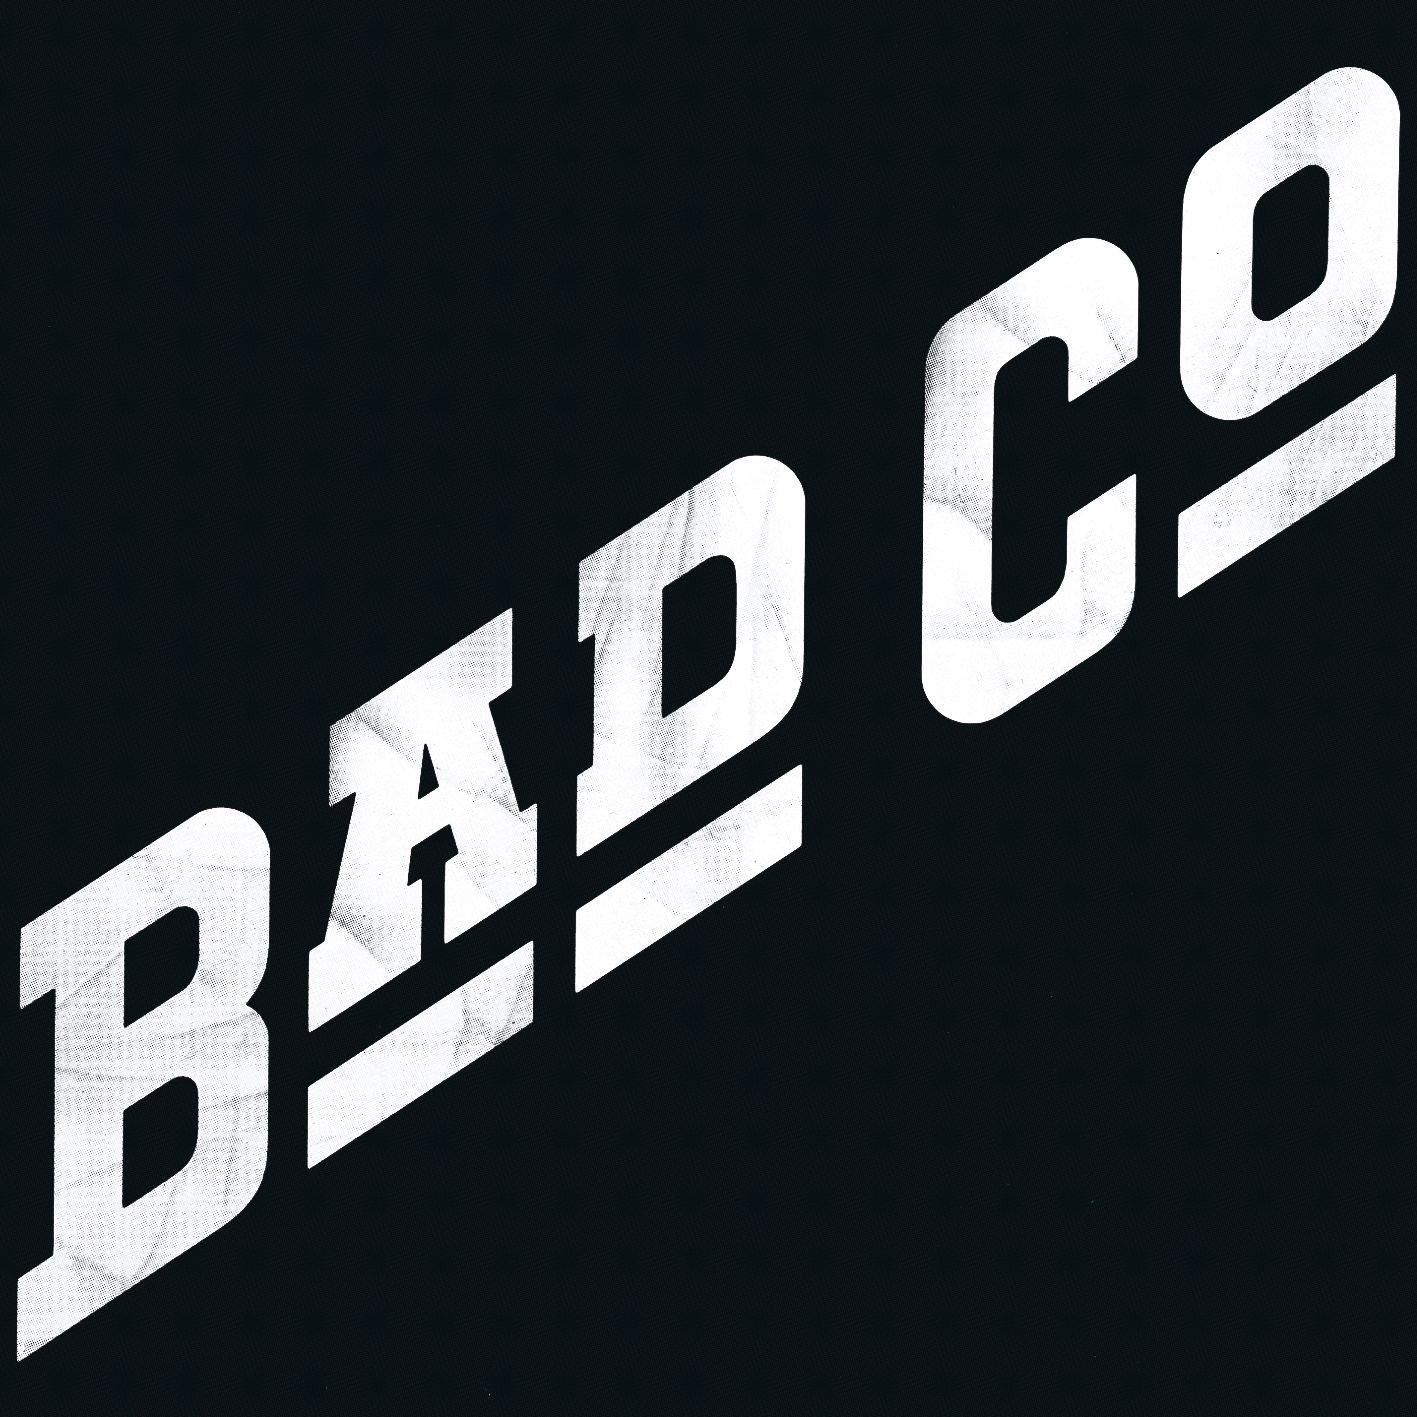 50 Years, 50 Albums 1974: Bad Company 'Bad Company'